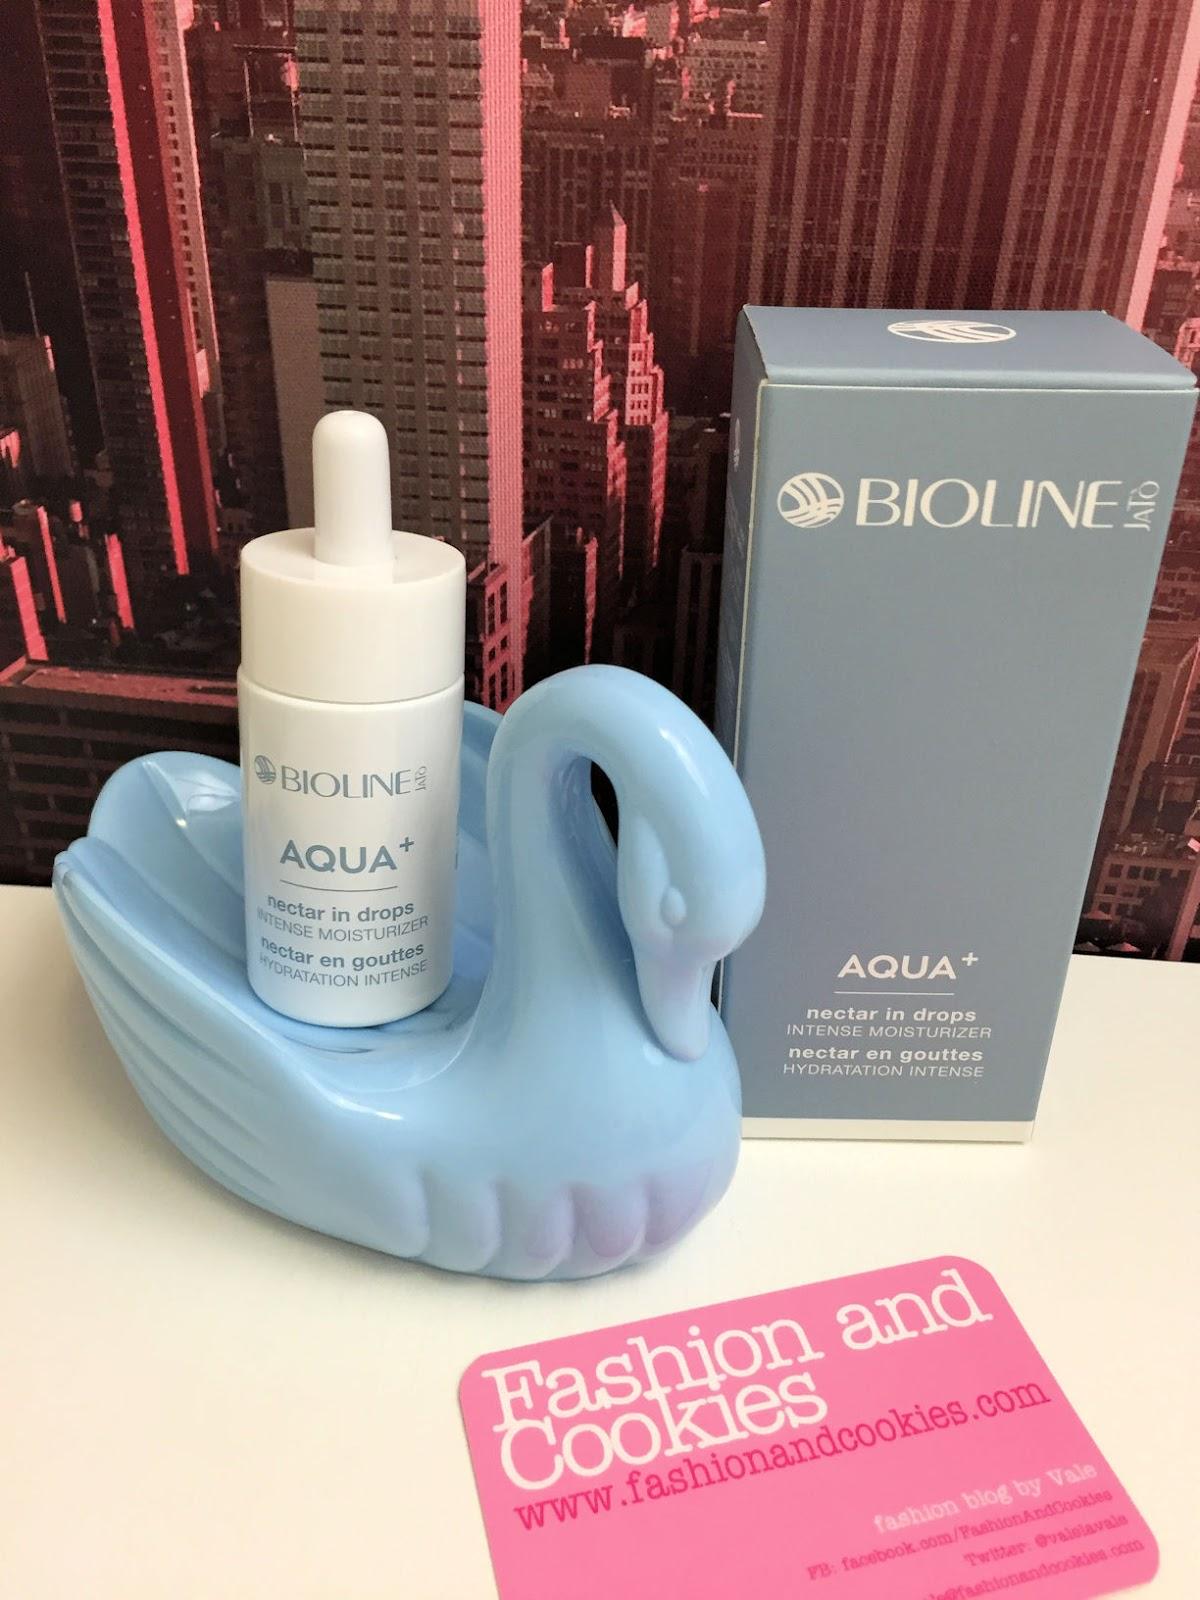 Bioline Jatò Aqua+ nettare in gocce idratazione intensiva review on Fashion and Cookies beauty blog, beauty blogger